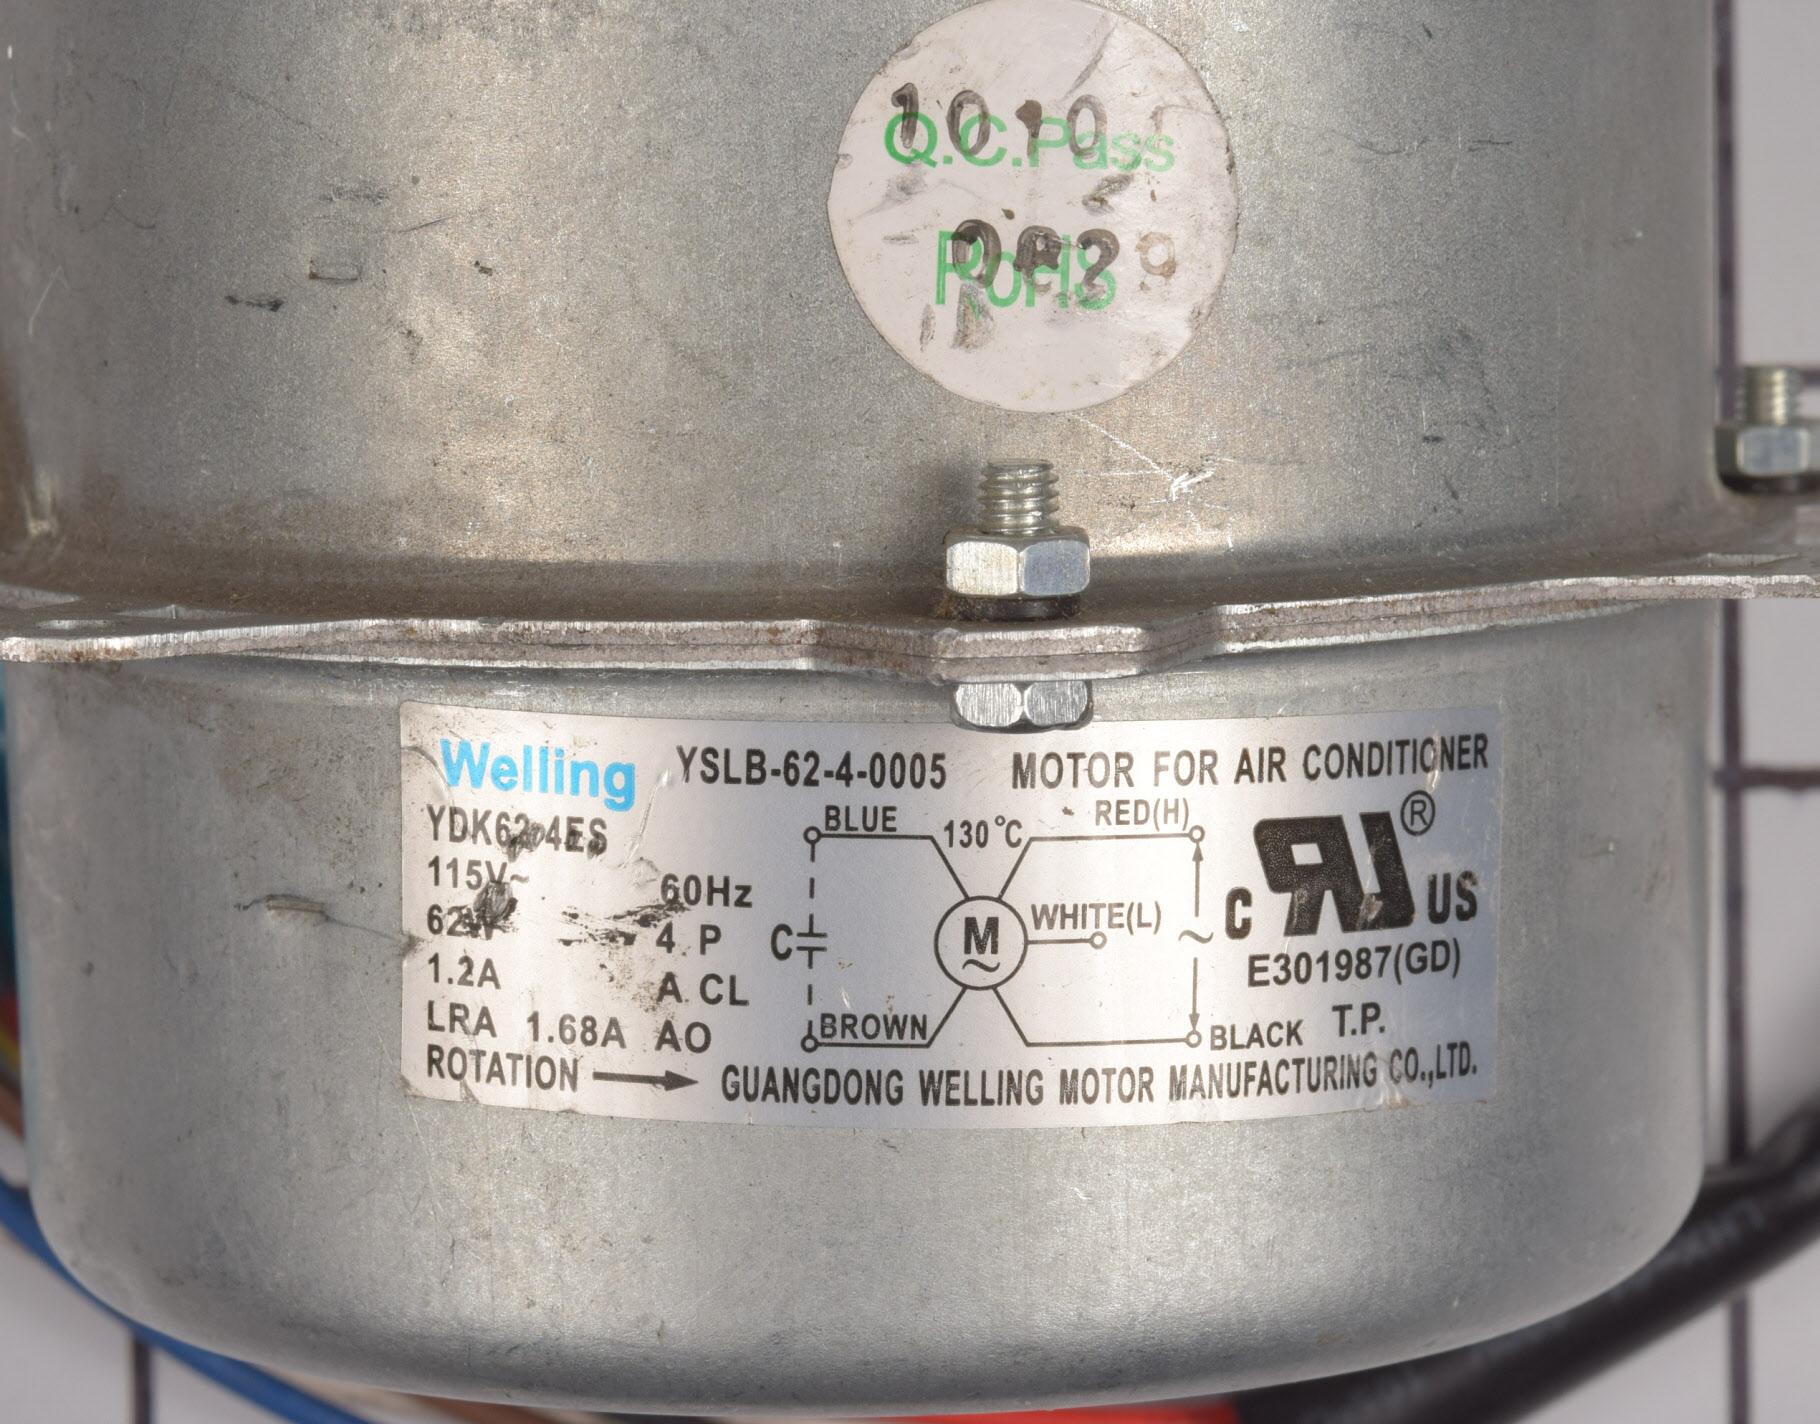 Frigidaire Air Conditioner Part # 5304479264 - Fan Motor